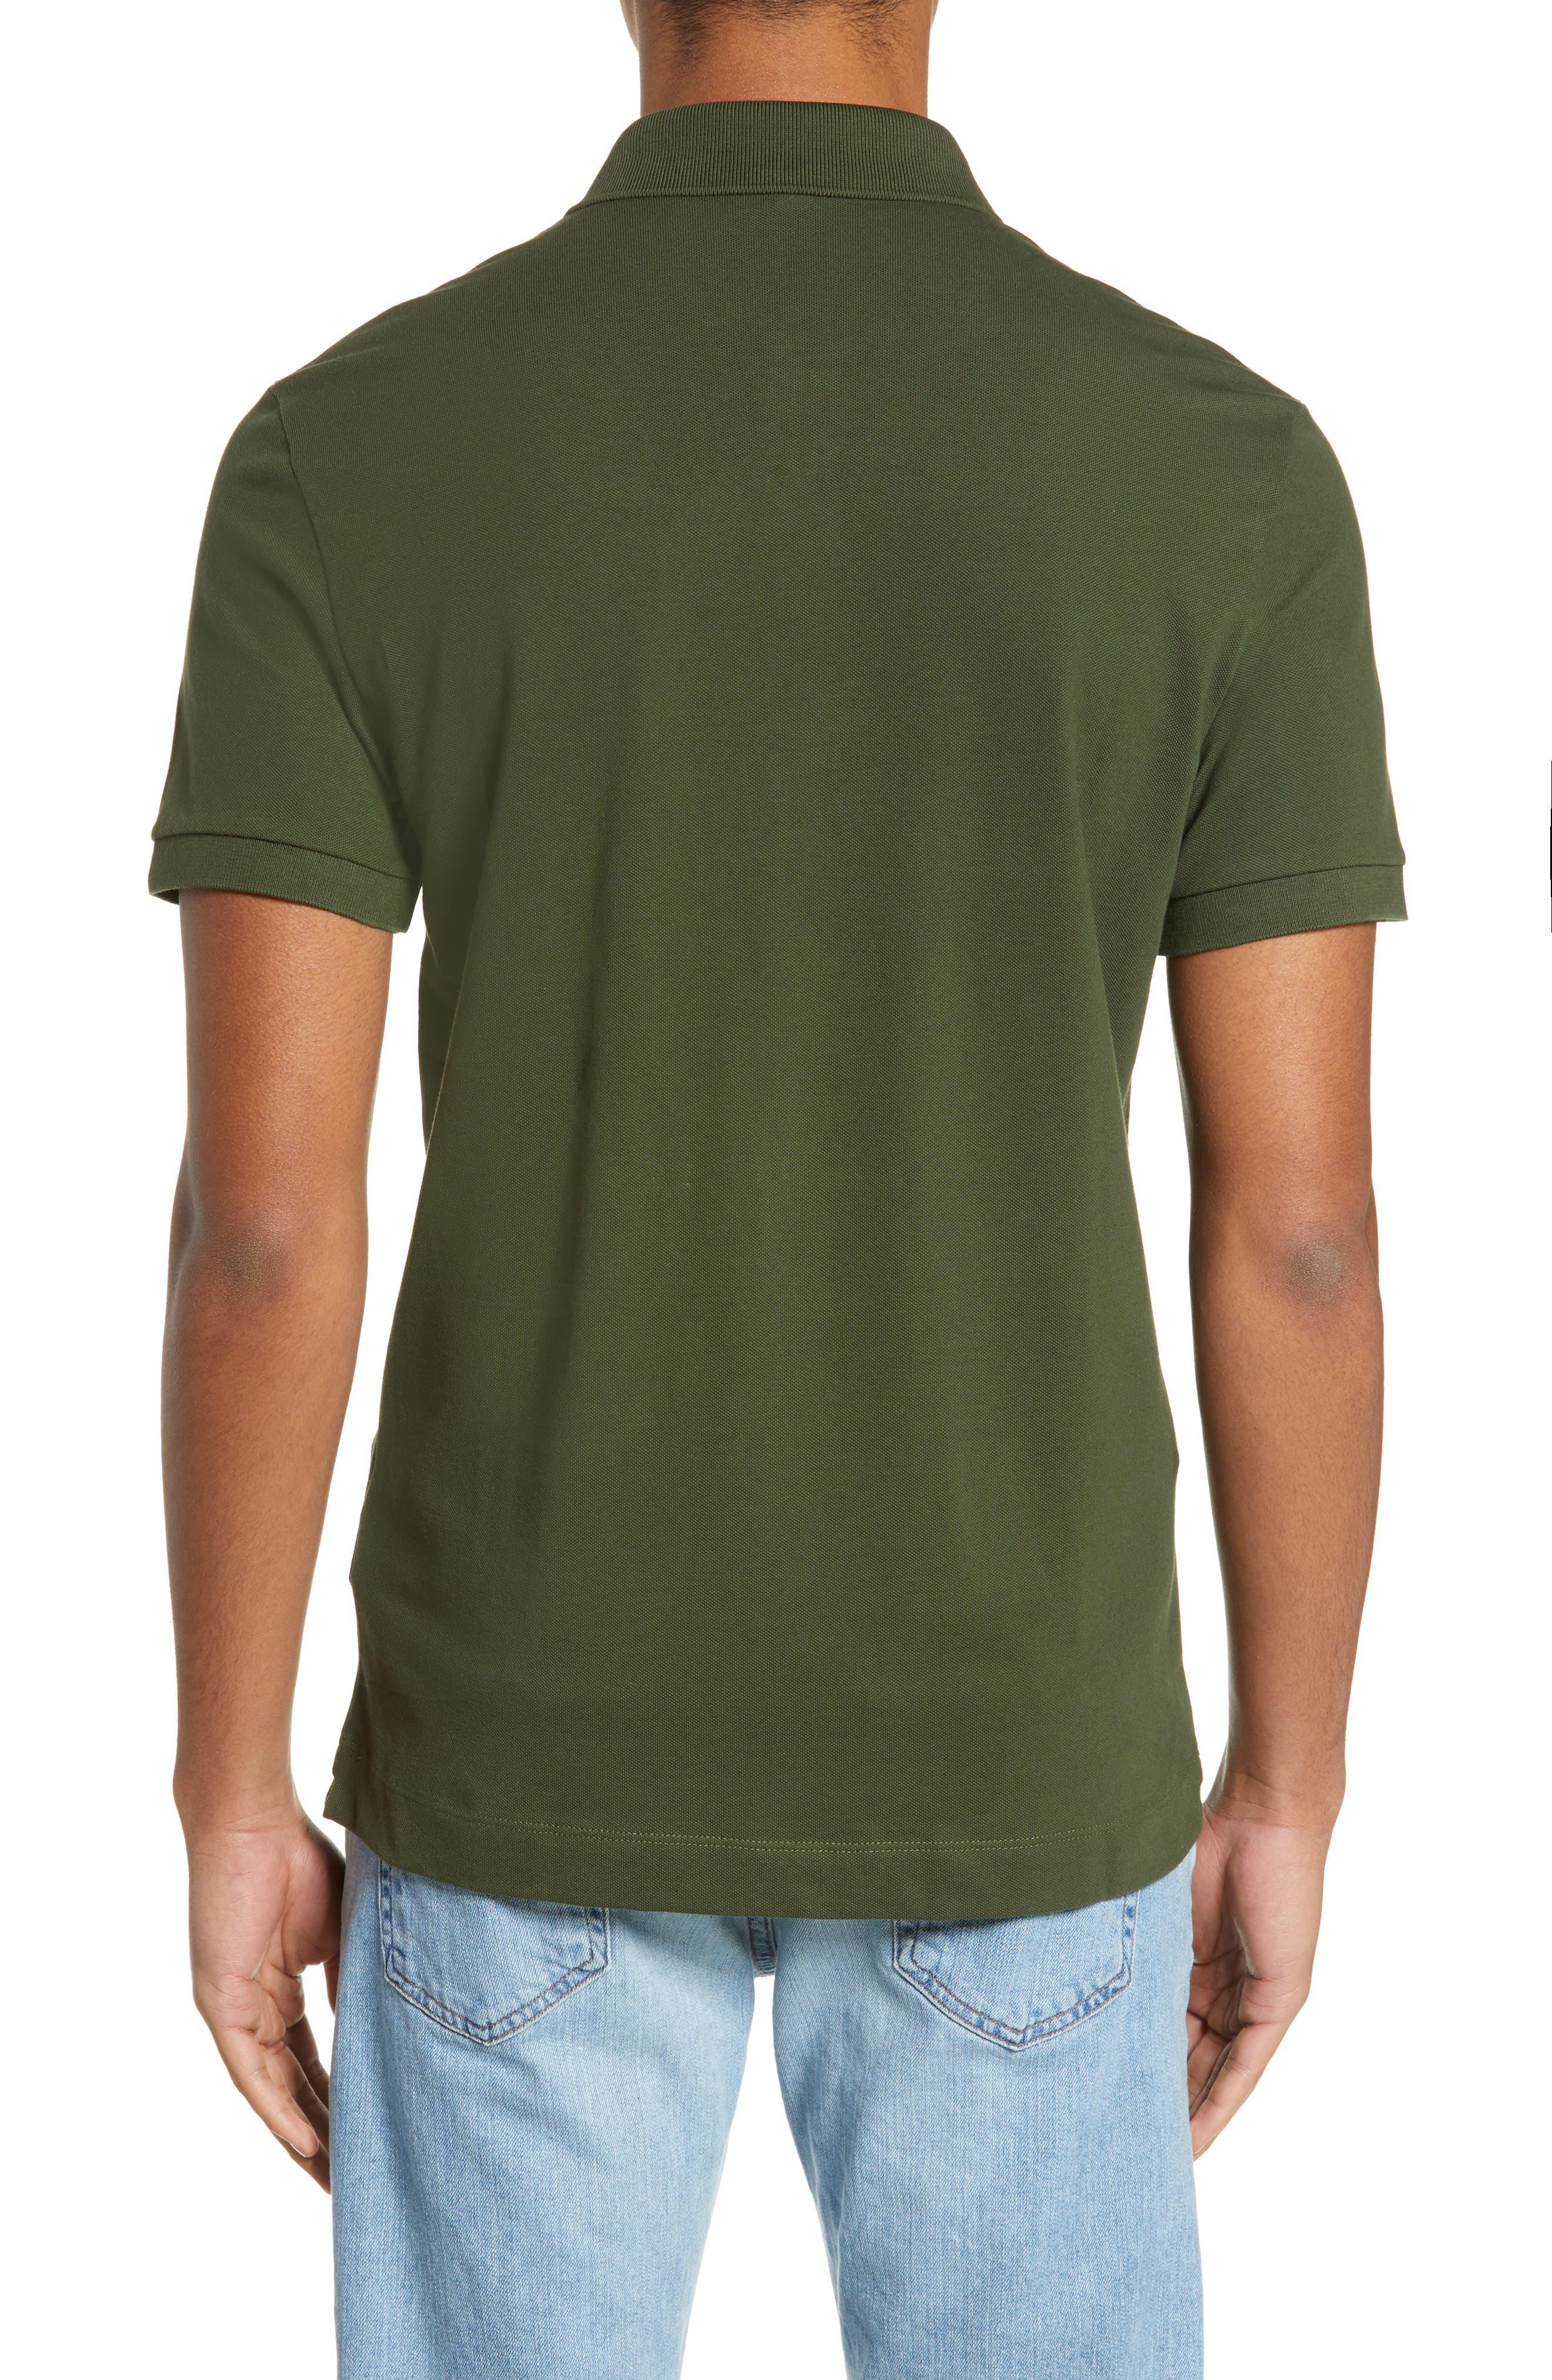 f52b2c36f27e18 Izod Polo Shirts With Alligator - DREAMWORKS